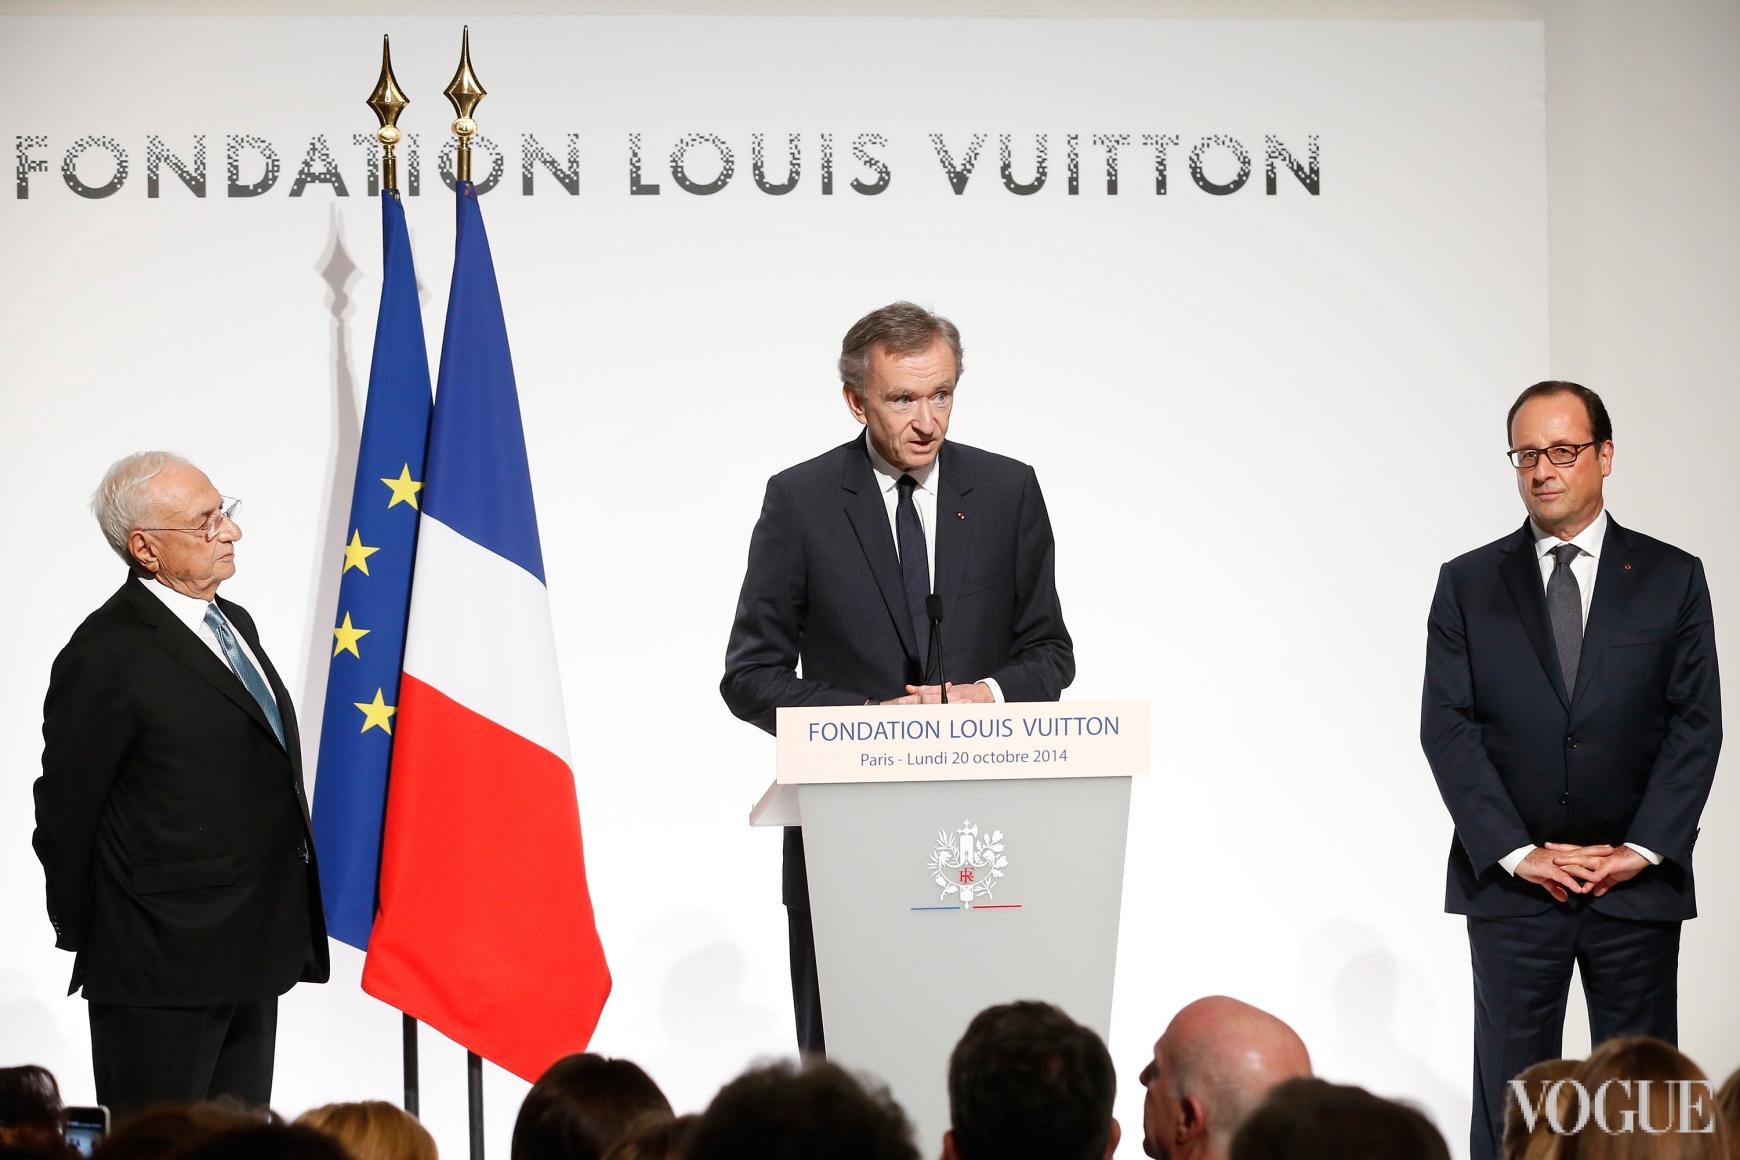 Бернар Арно и Франсуа Олланд